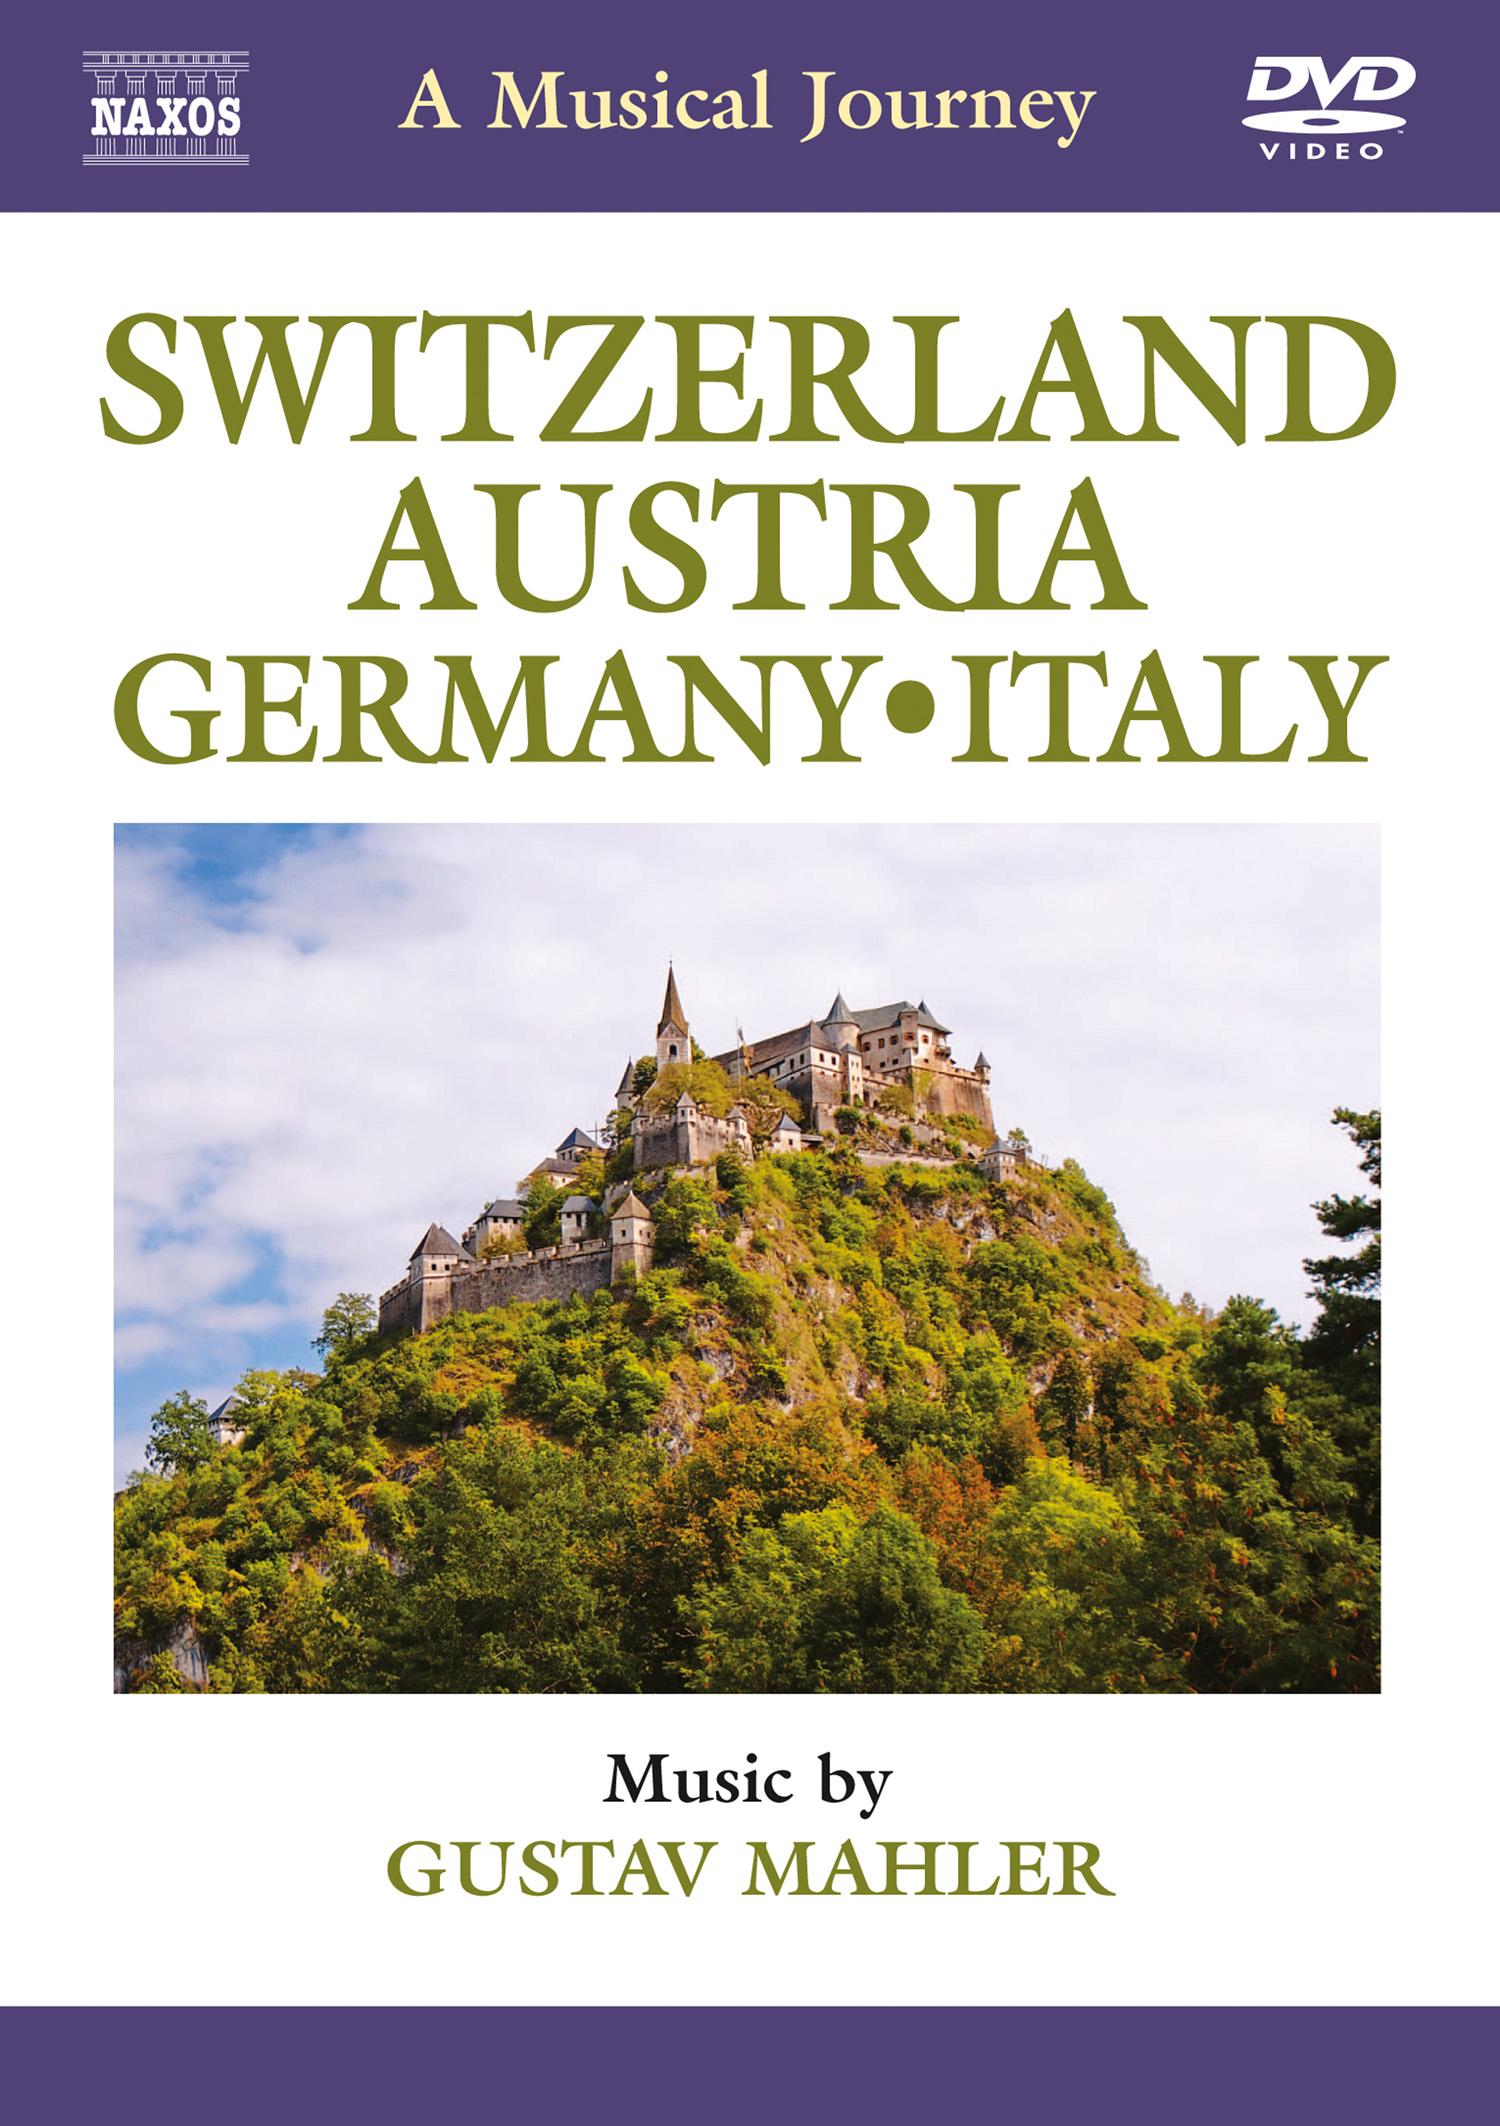 A Musical Journey: Switzerland, Austria, Germany, Italy